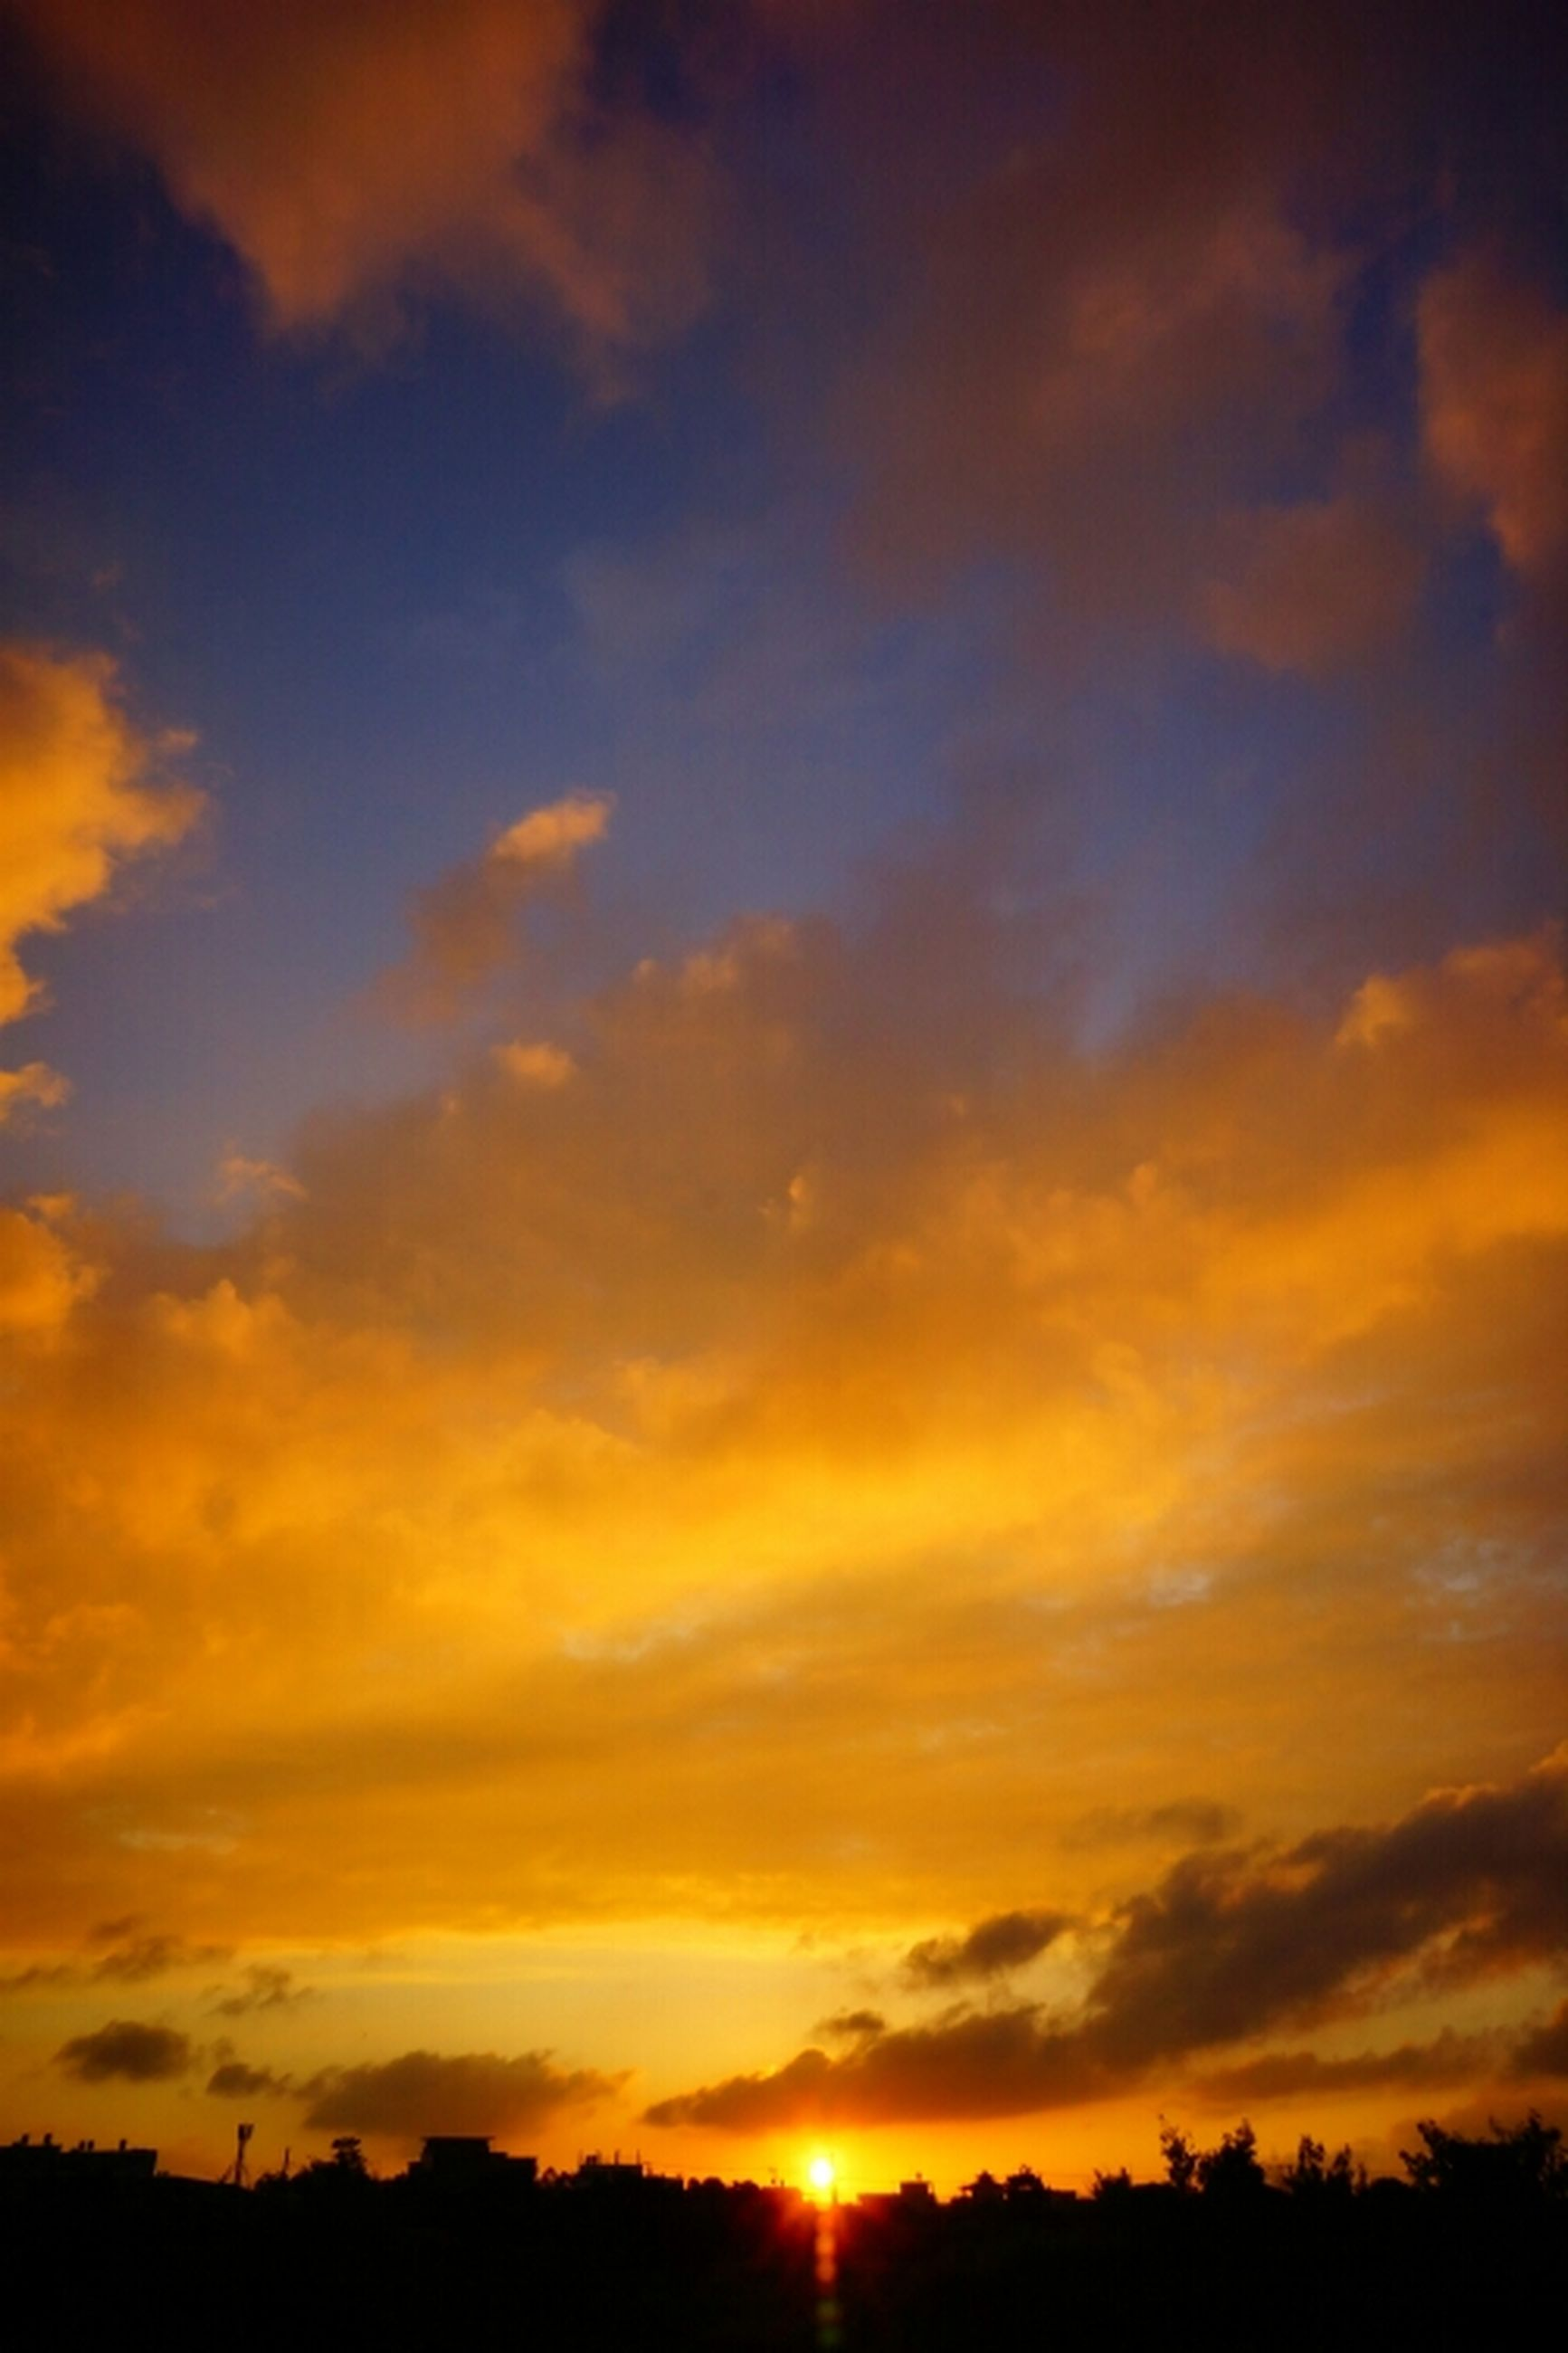 sunset, orange color, silhouette, scenics, sky, tranquil scene, beauty in nature, tranquility, sun, idyllic, nature, cloud - sky, dramatic sky, cloud, sunlight, landscape, majestic, outdoors, no people, moody sky